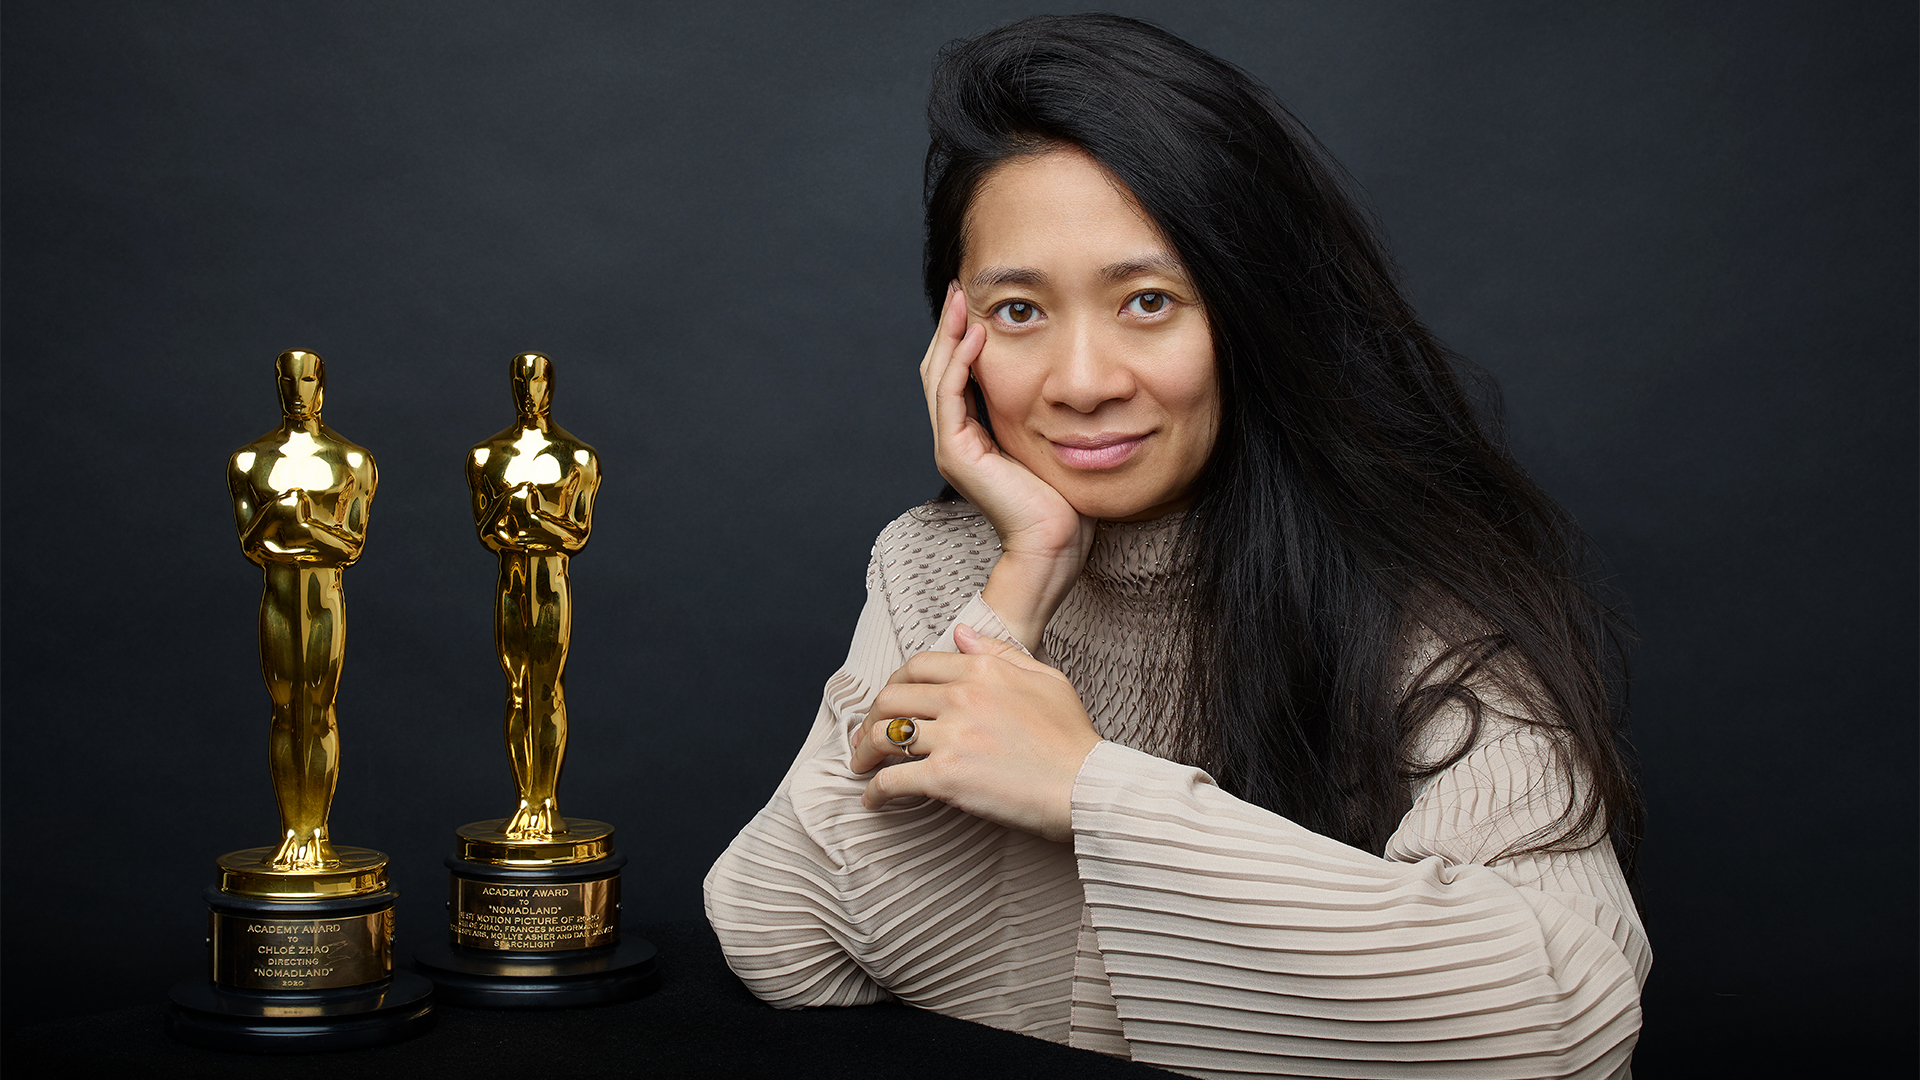 2021 Oscar History-Maker Chloé Zhao Talks 'The Eternals' & 'Dracula' -  Variety